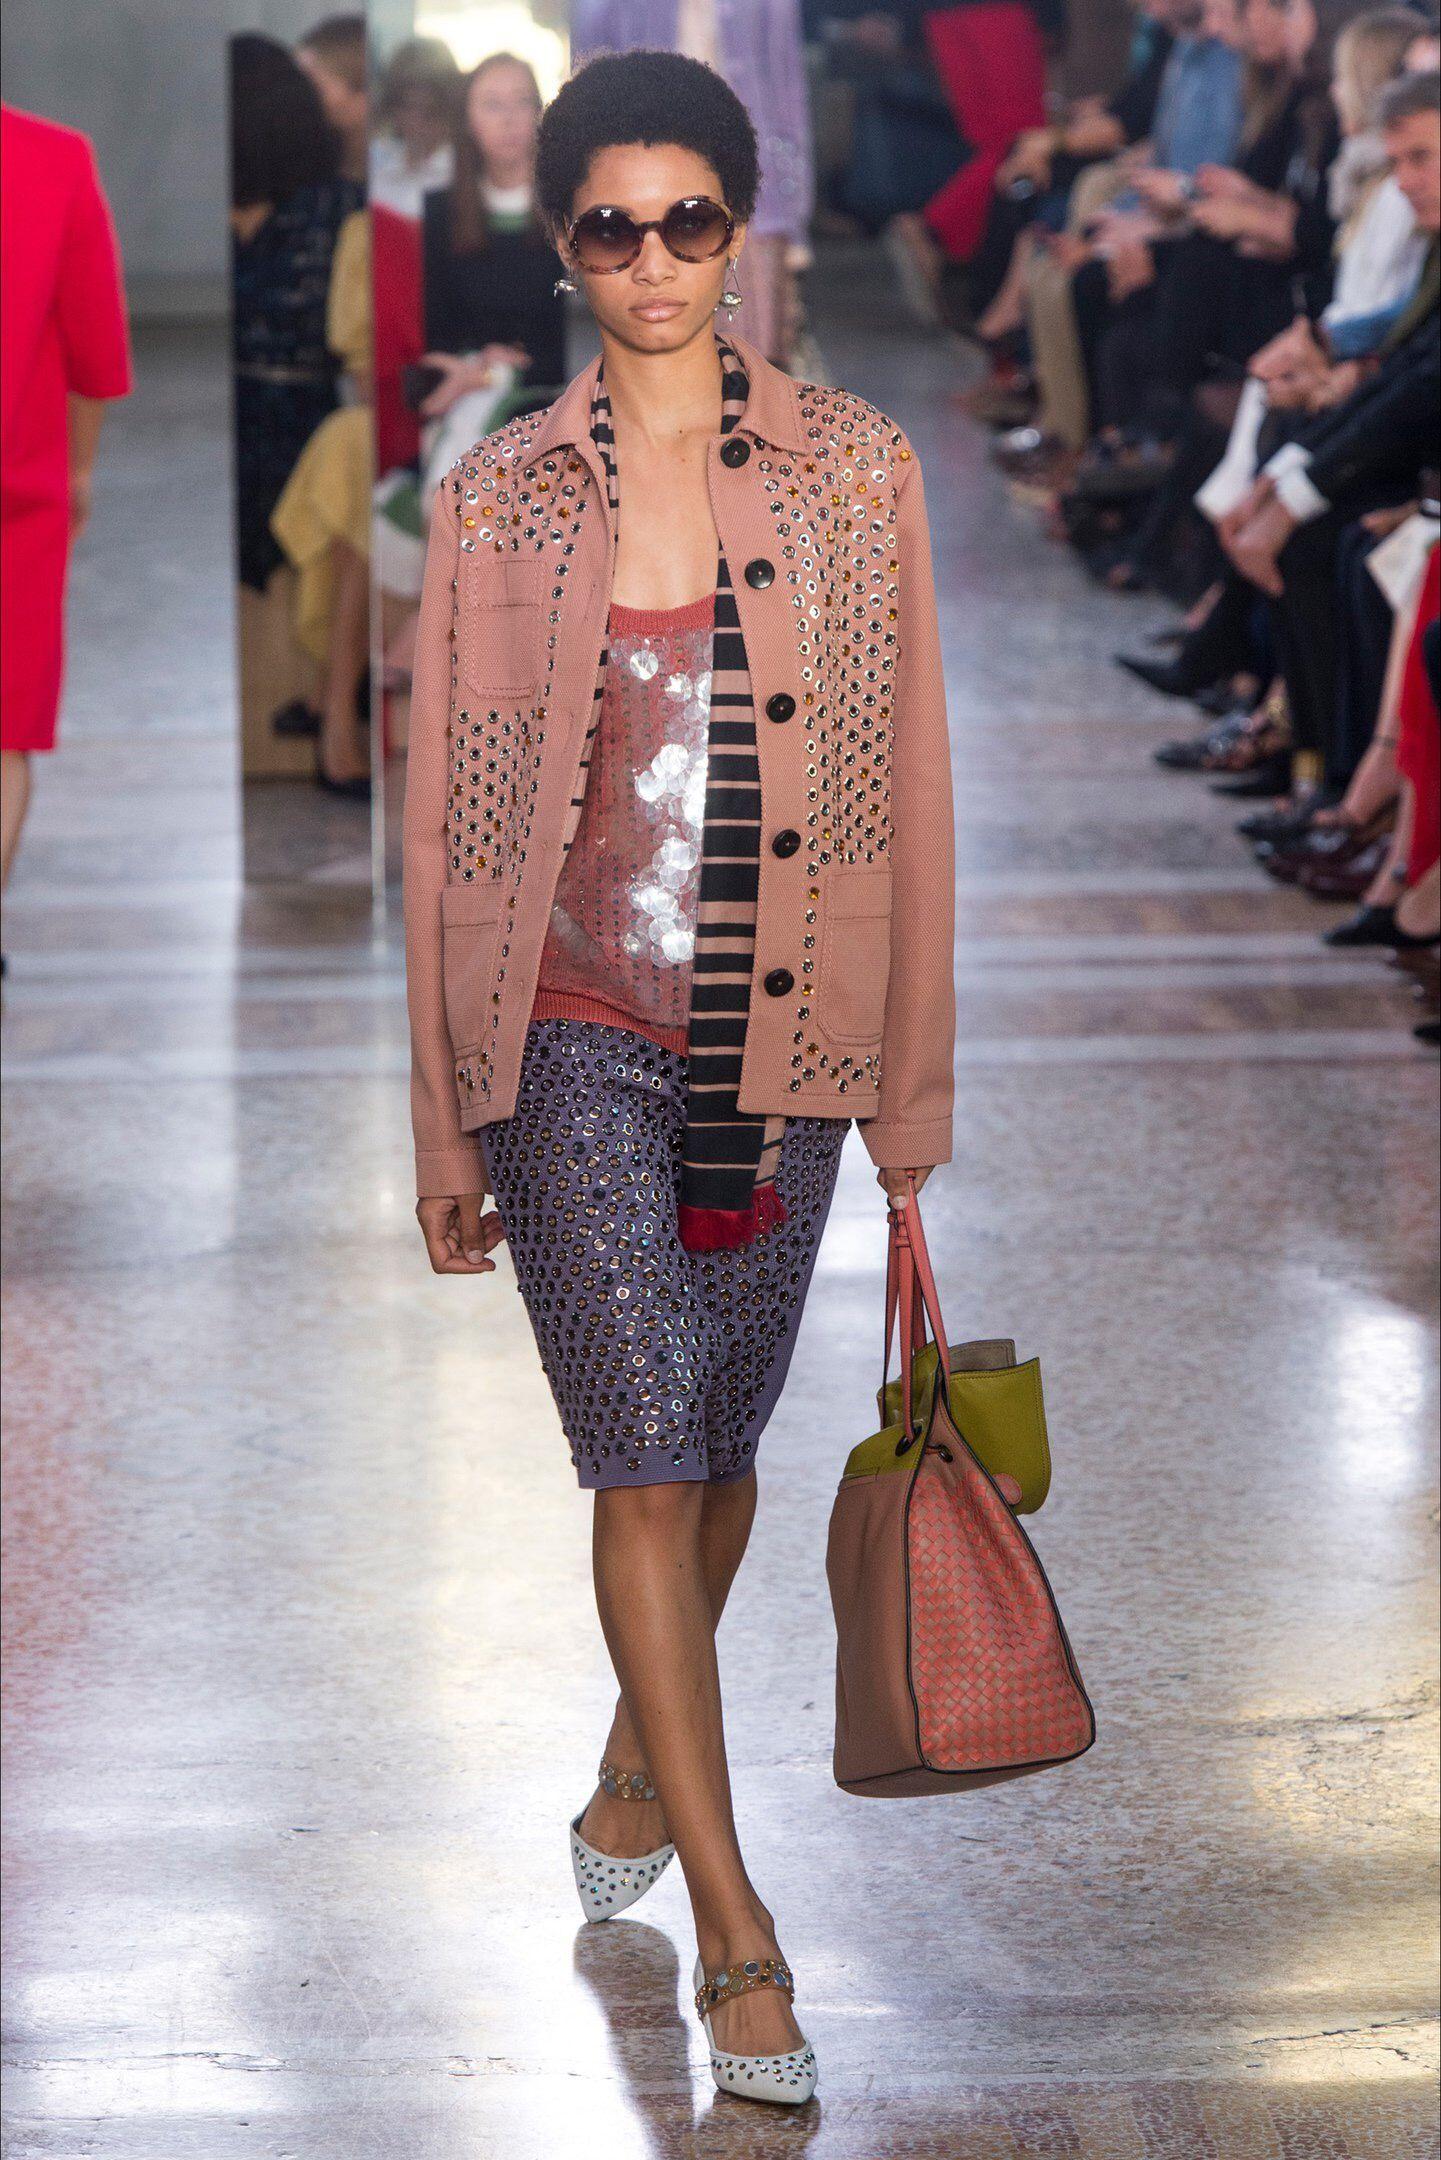 Pin by janice matthias on fashion daywear pinterest fashion